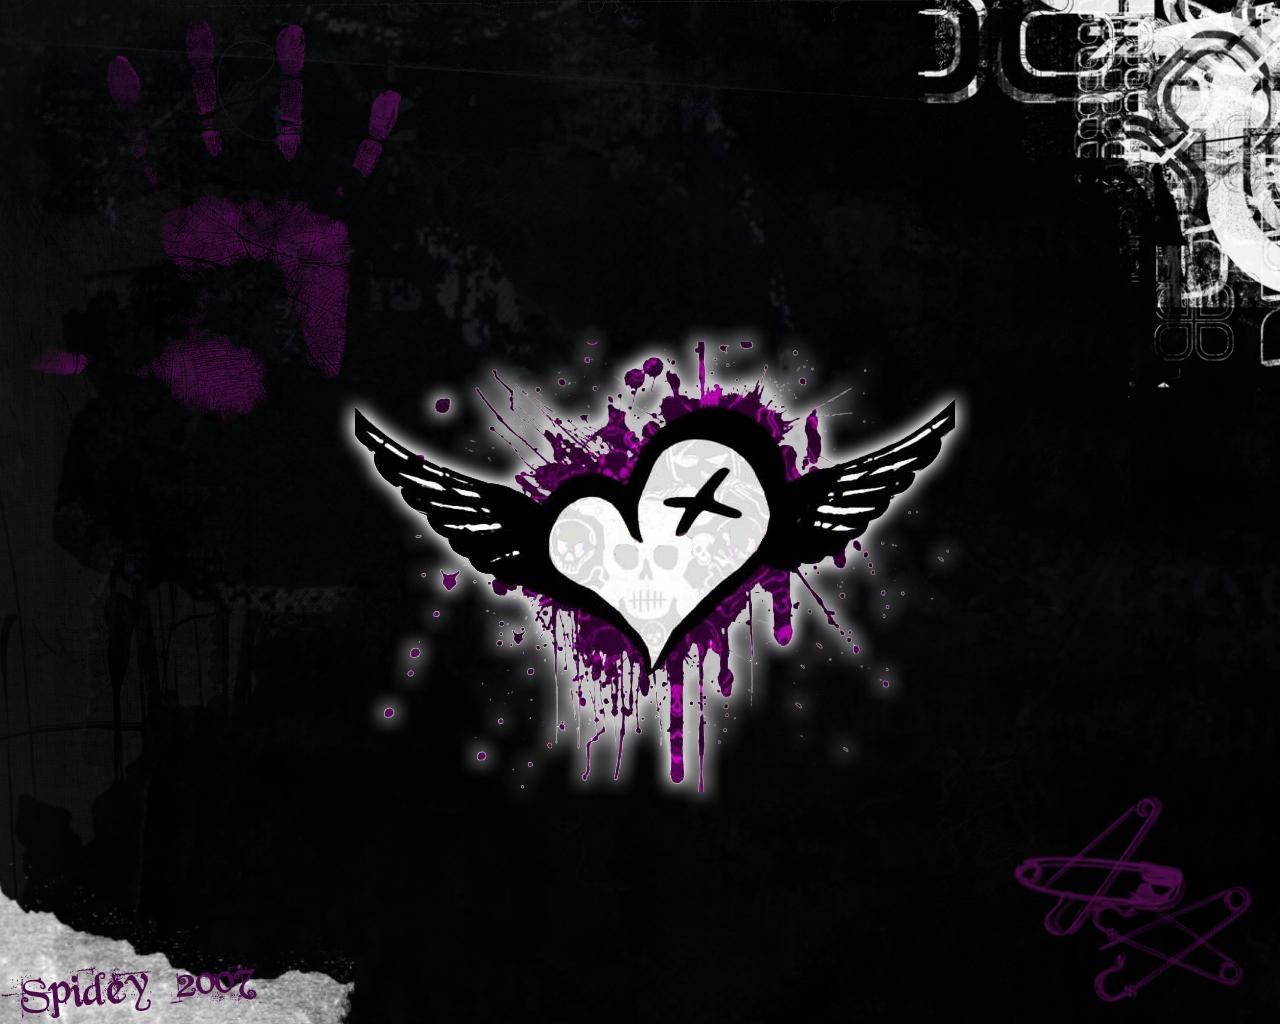 Anime Emo Love Wallpaper : Emo Anime Wallpaper - WallpaperSafari